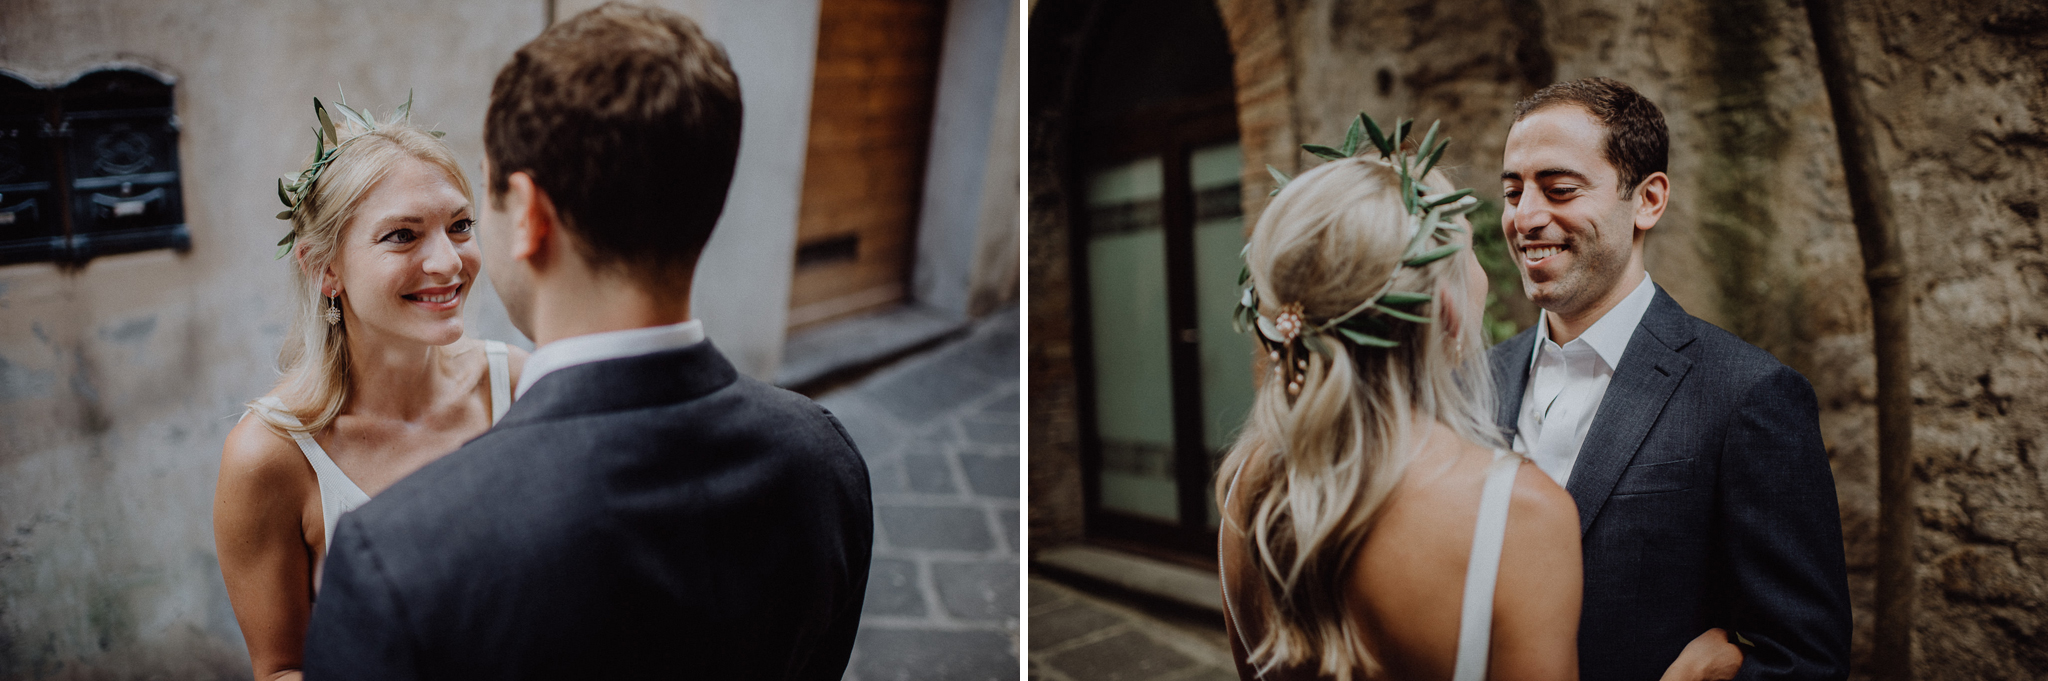 matrimonio_orvieto